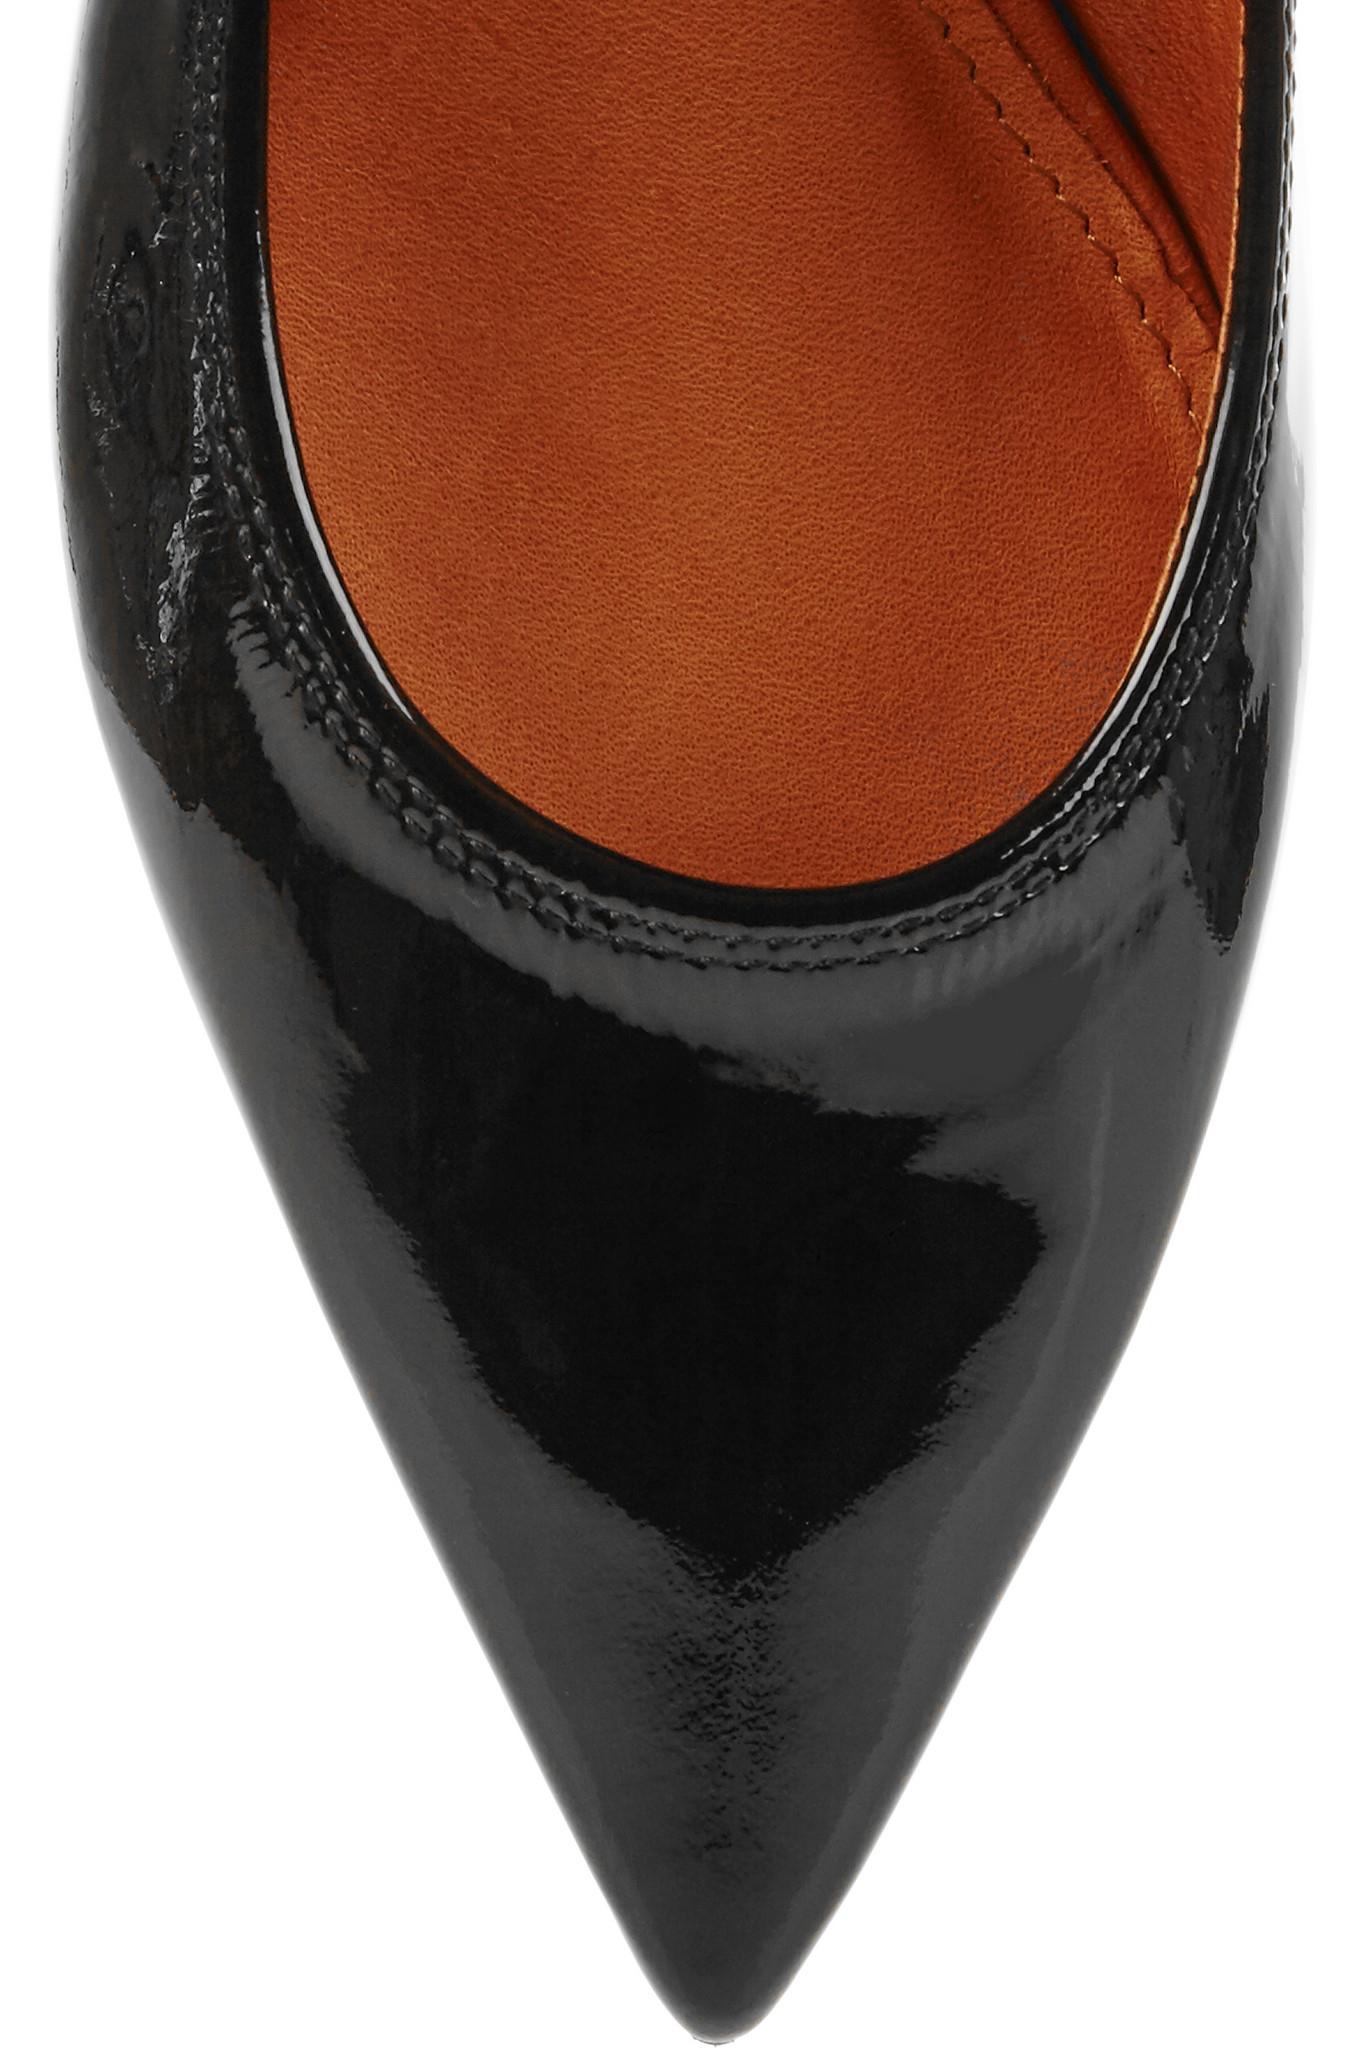 3634deb3e710 Lyst - Lanvin Patent-leather Point-toe Flats in Black